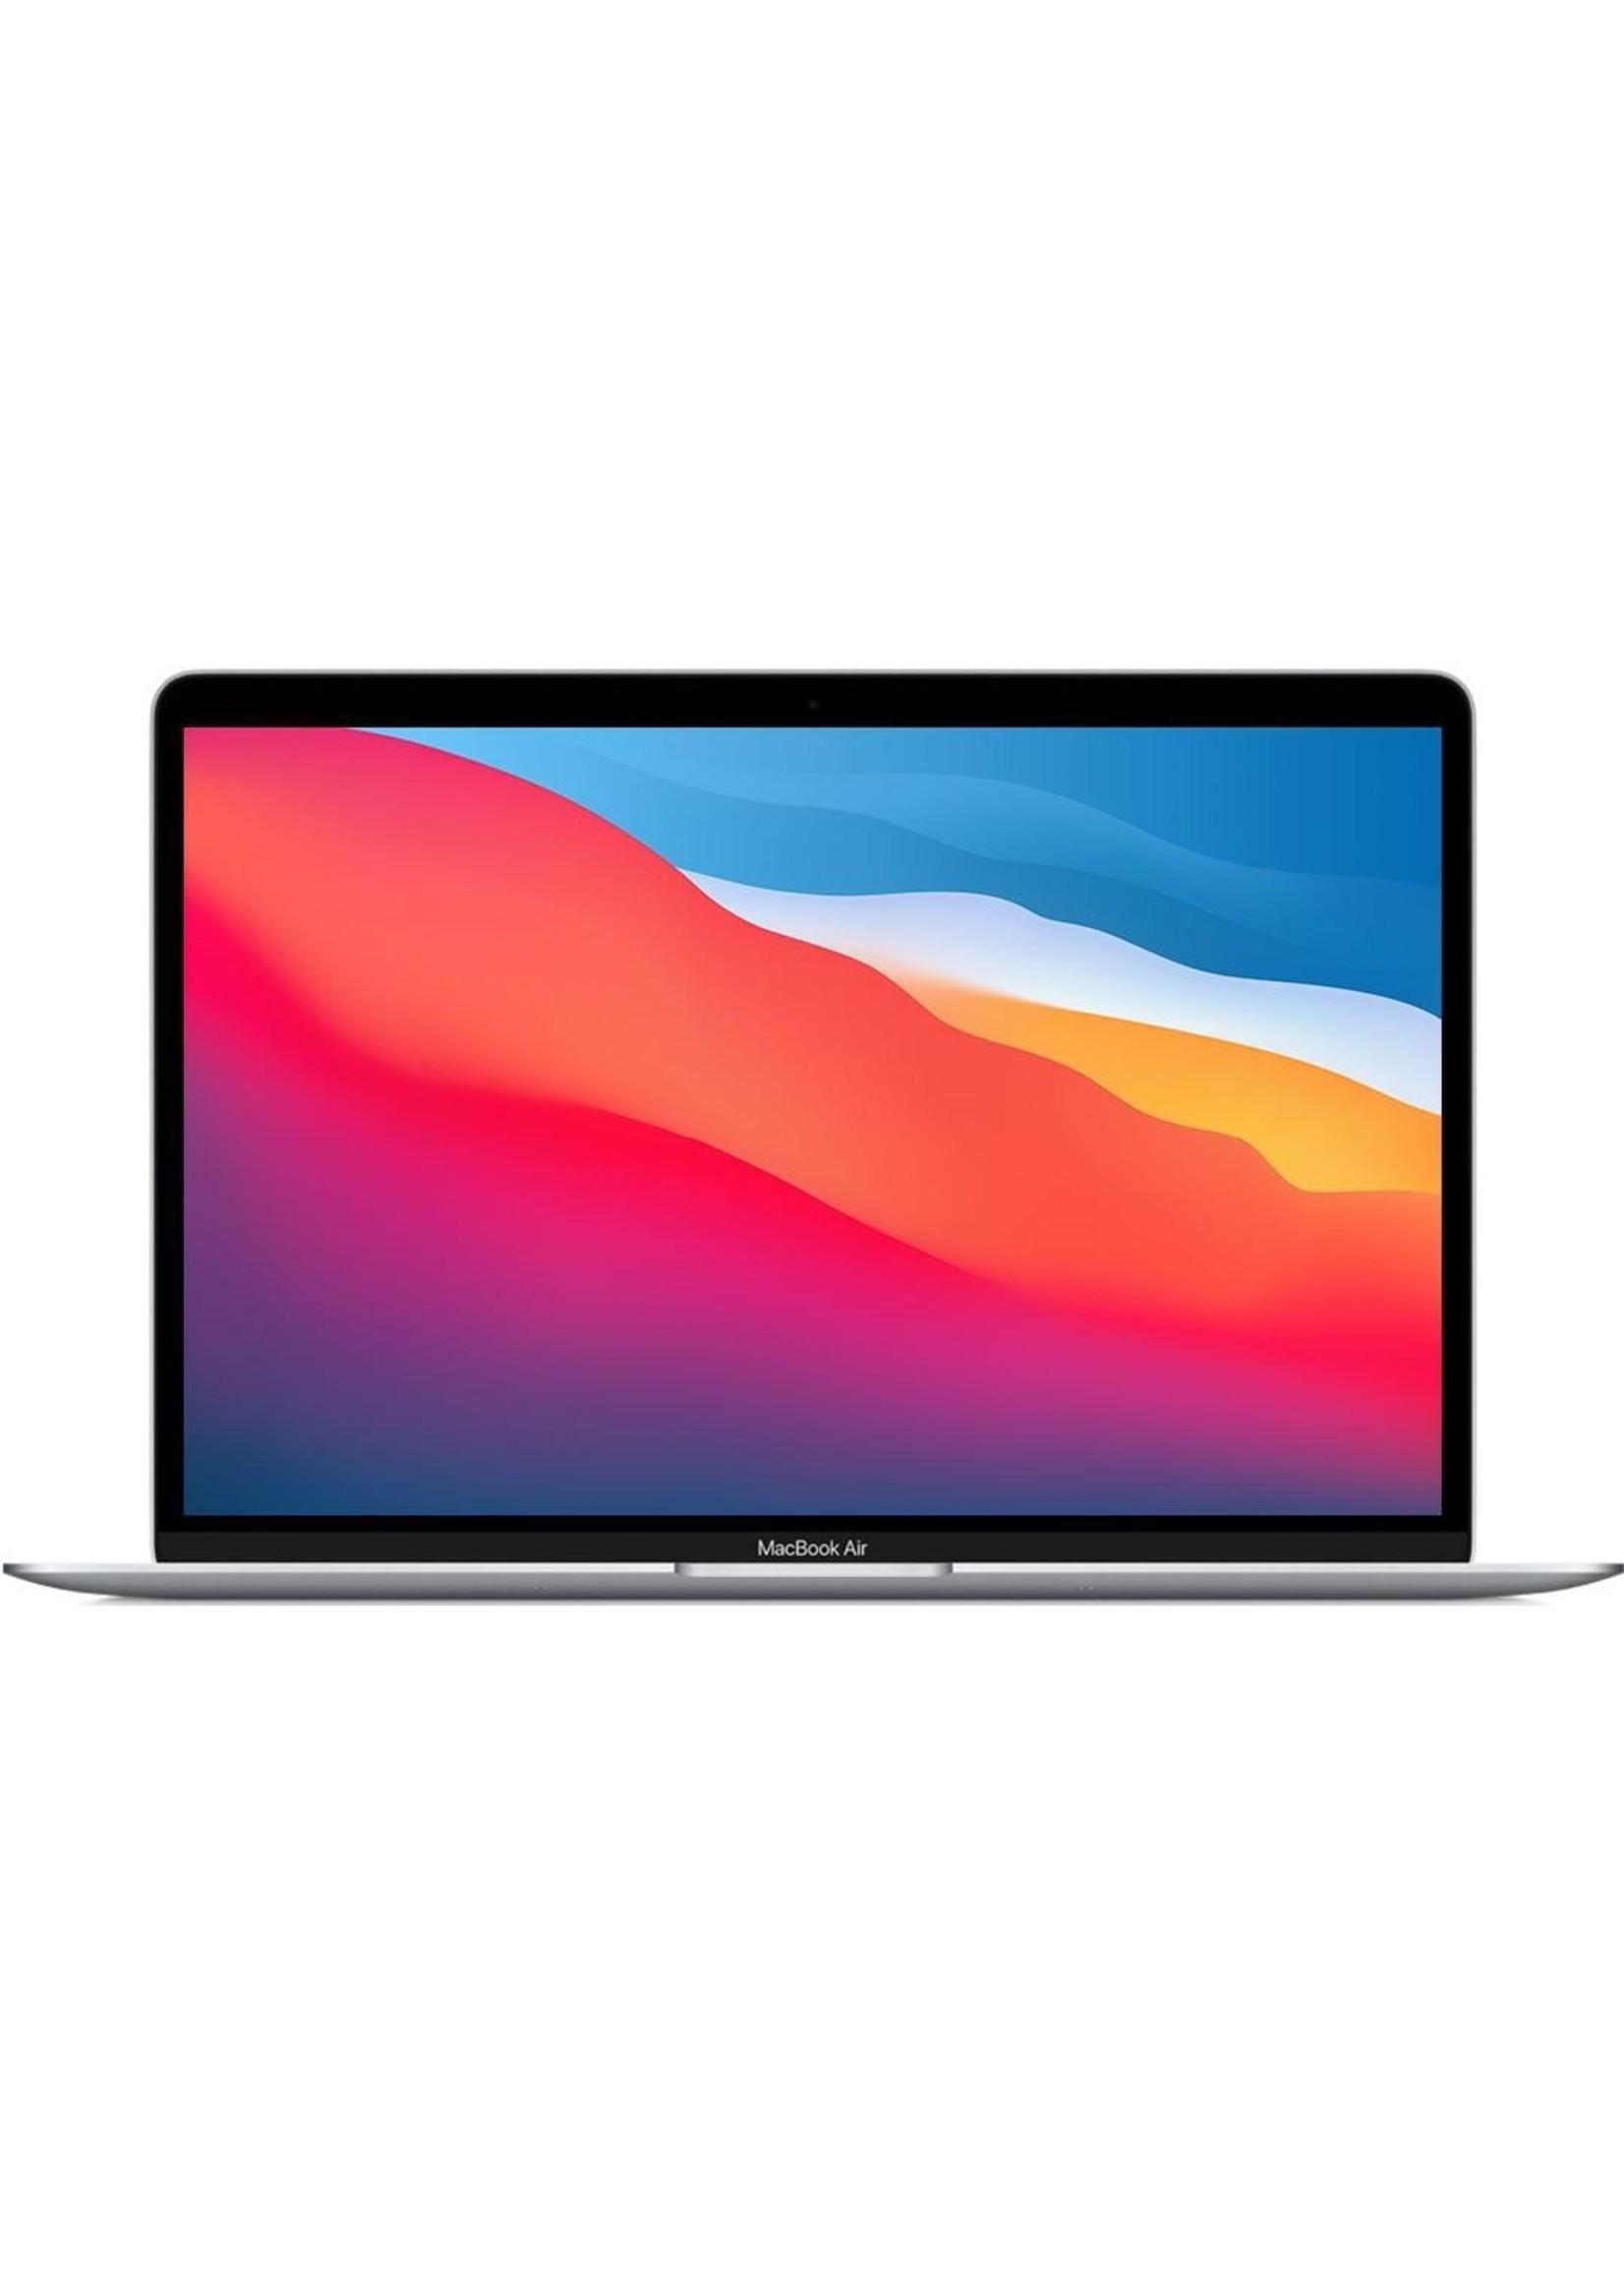 Apple MacBook Air 13-inch 512GB Silver